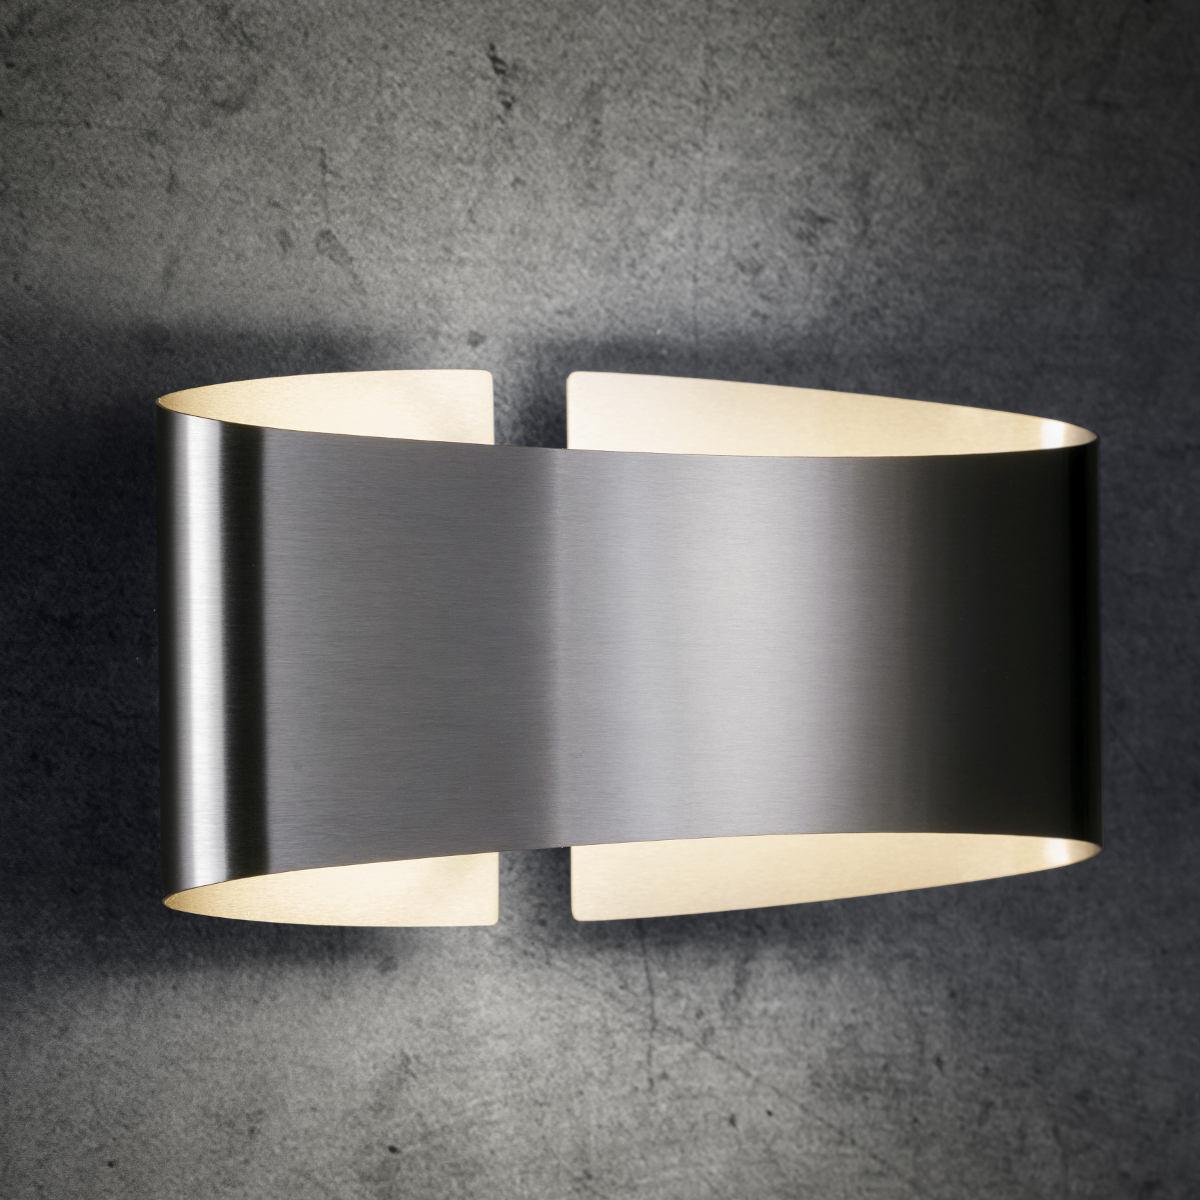 Blendfreie, gebogene Design Wandleuchte VOILÀ LED   Casa Lumi